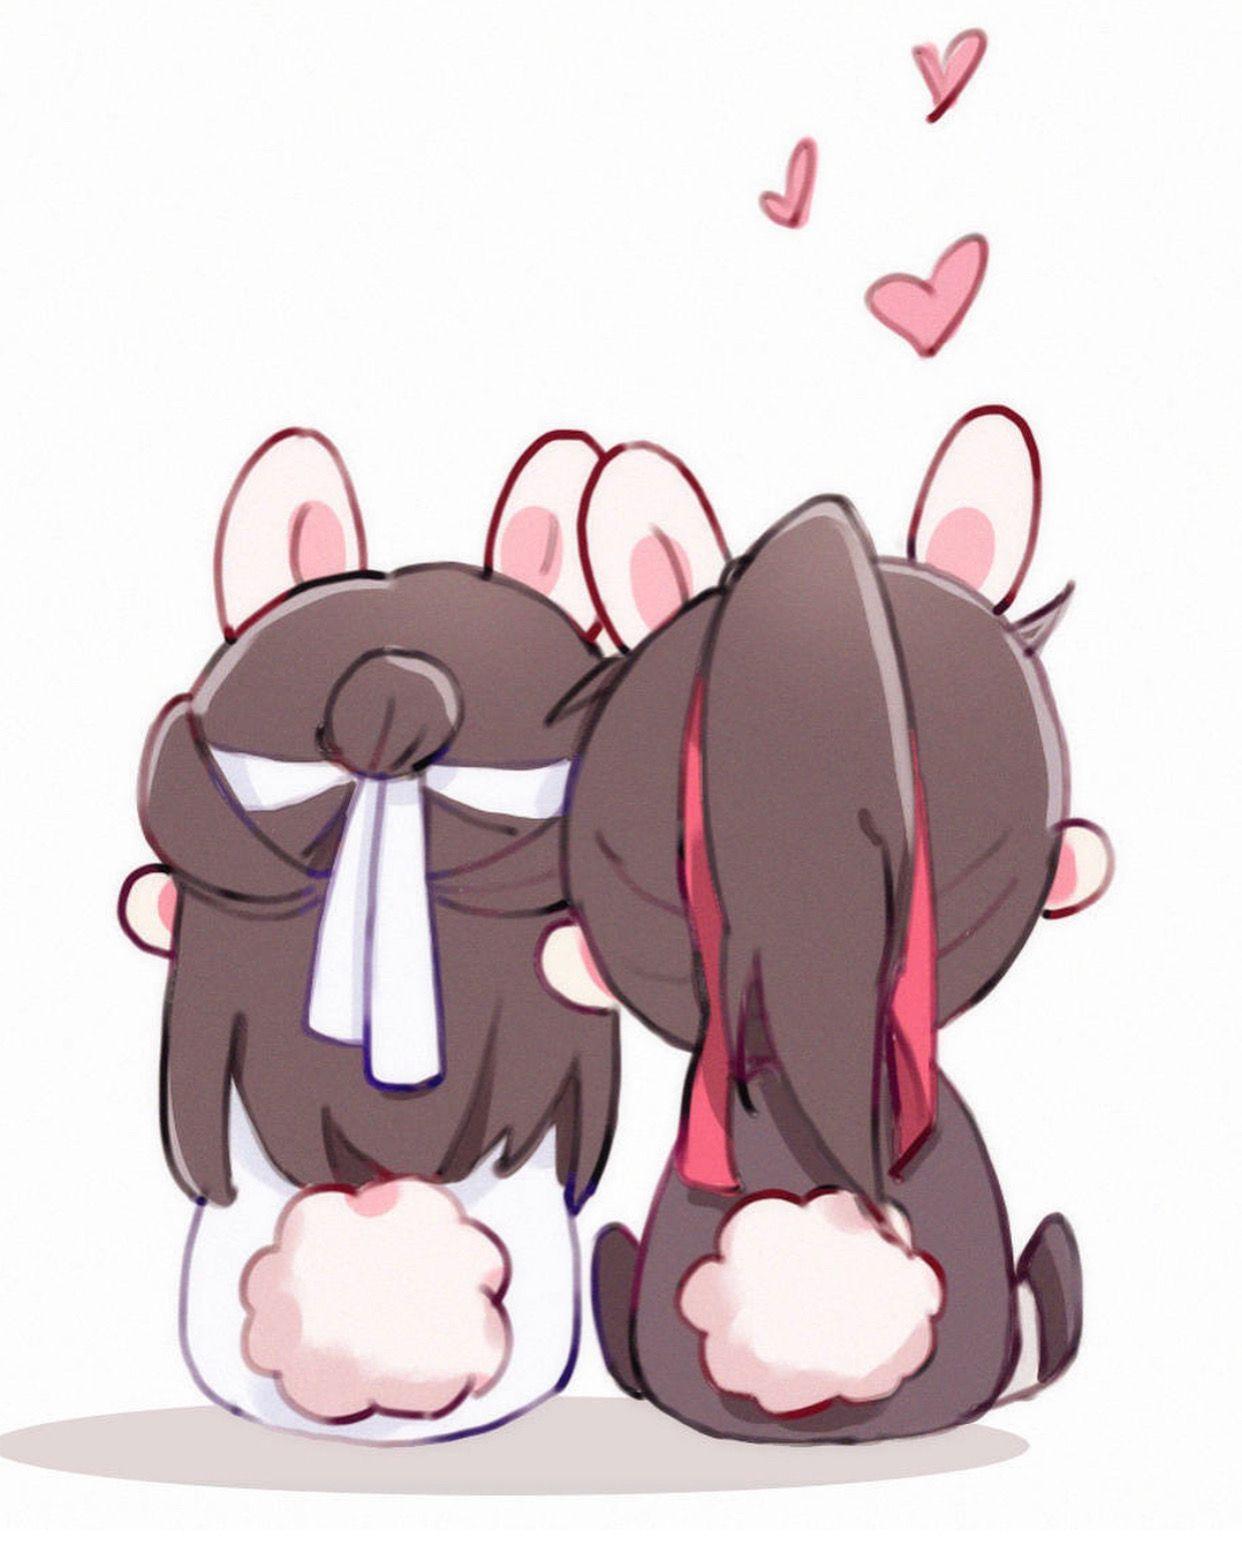 Ghim của Destiyana Cindy trên Cute (Có hình ảnh) Anime